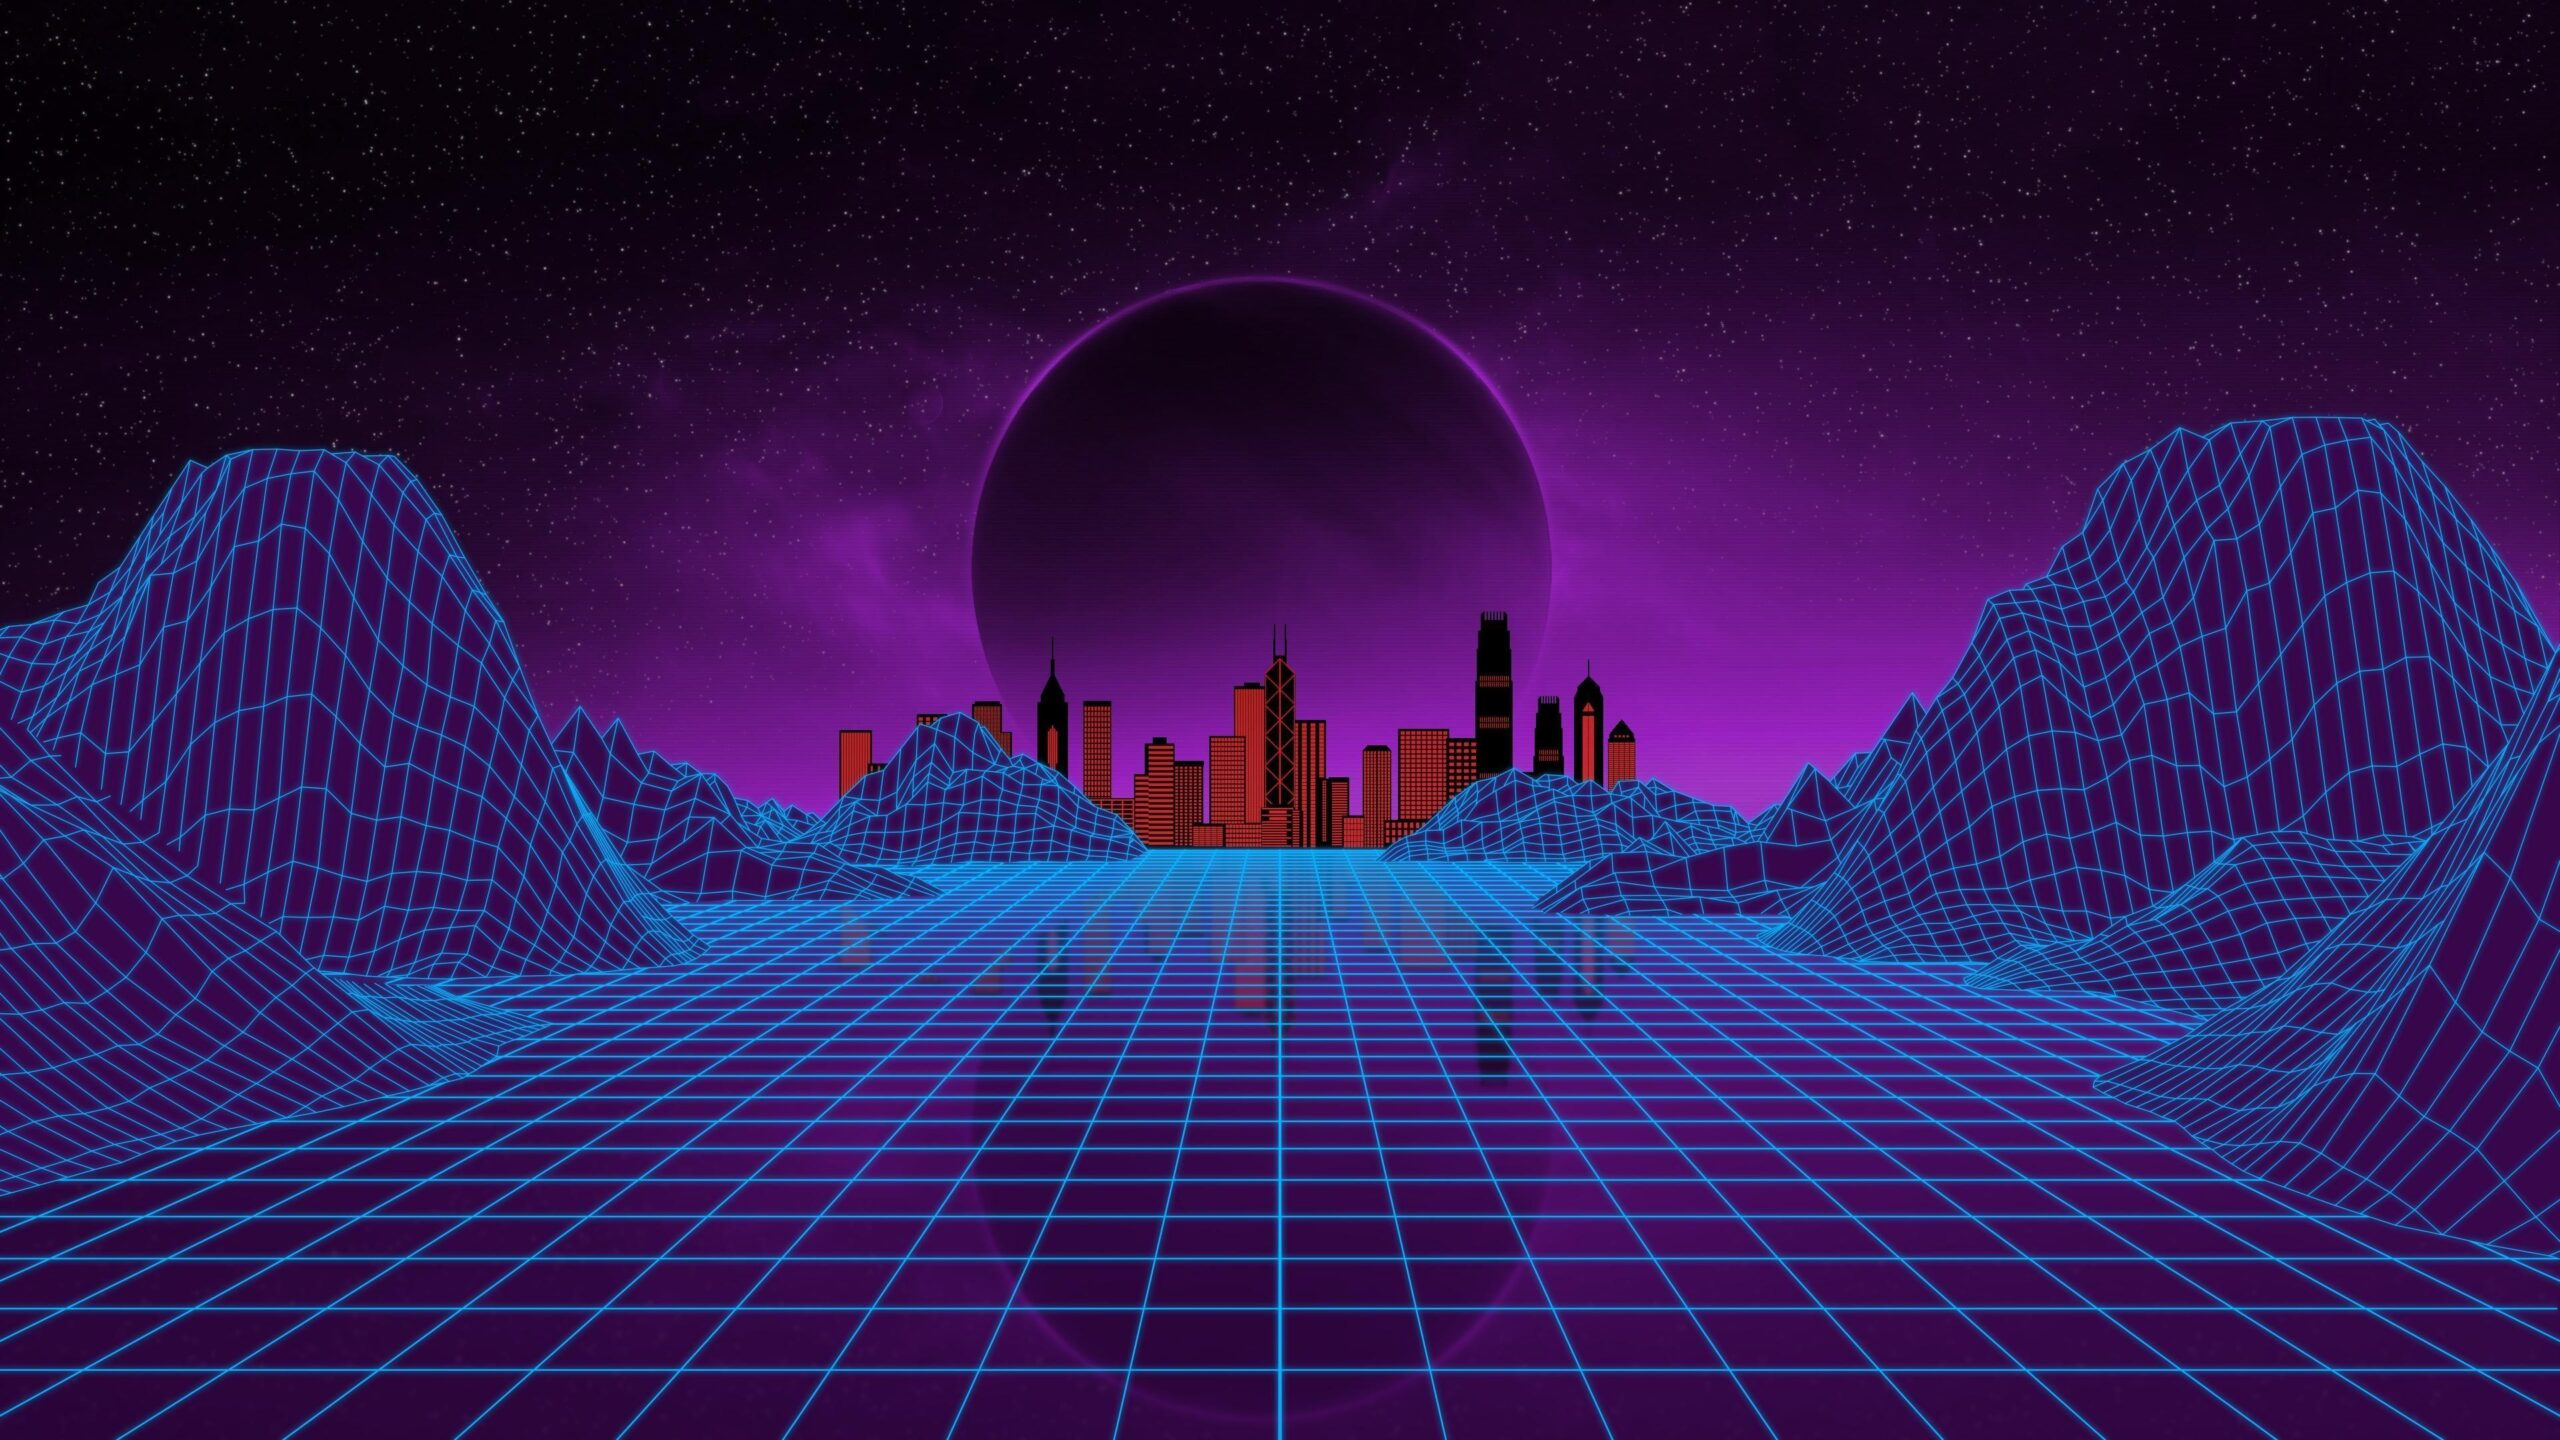 synthwave wallpaper 4k